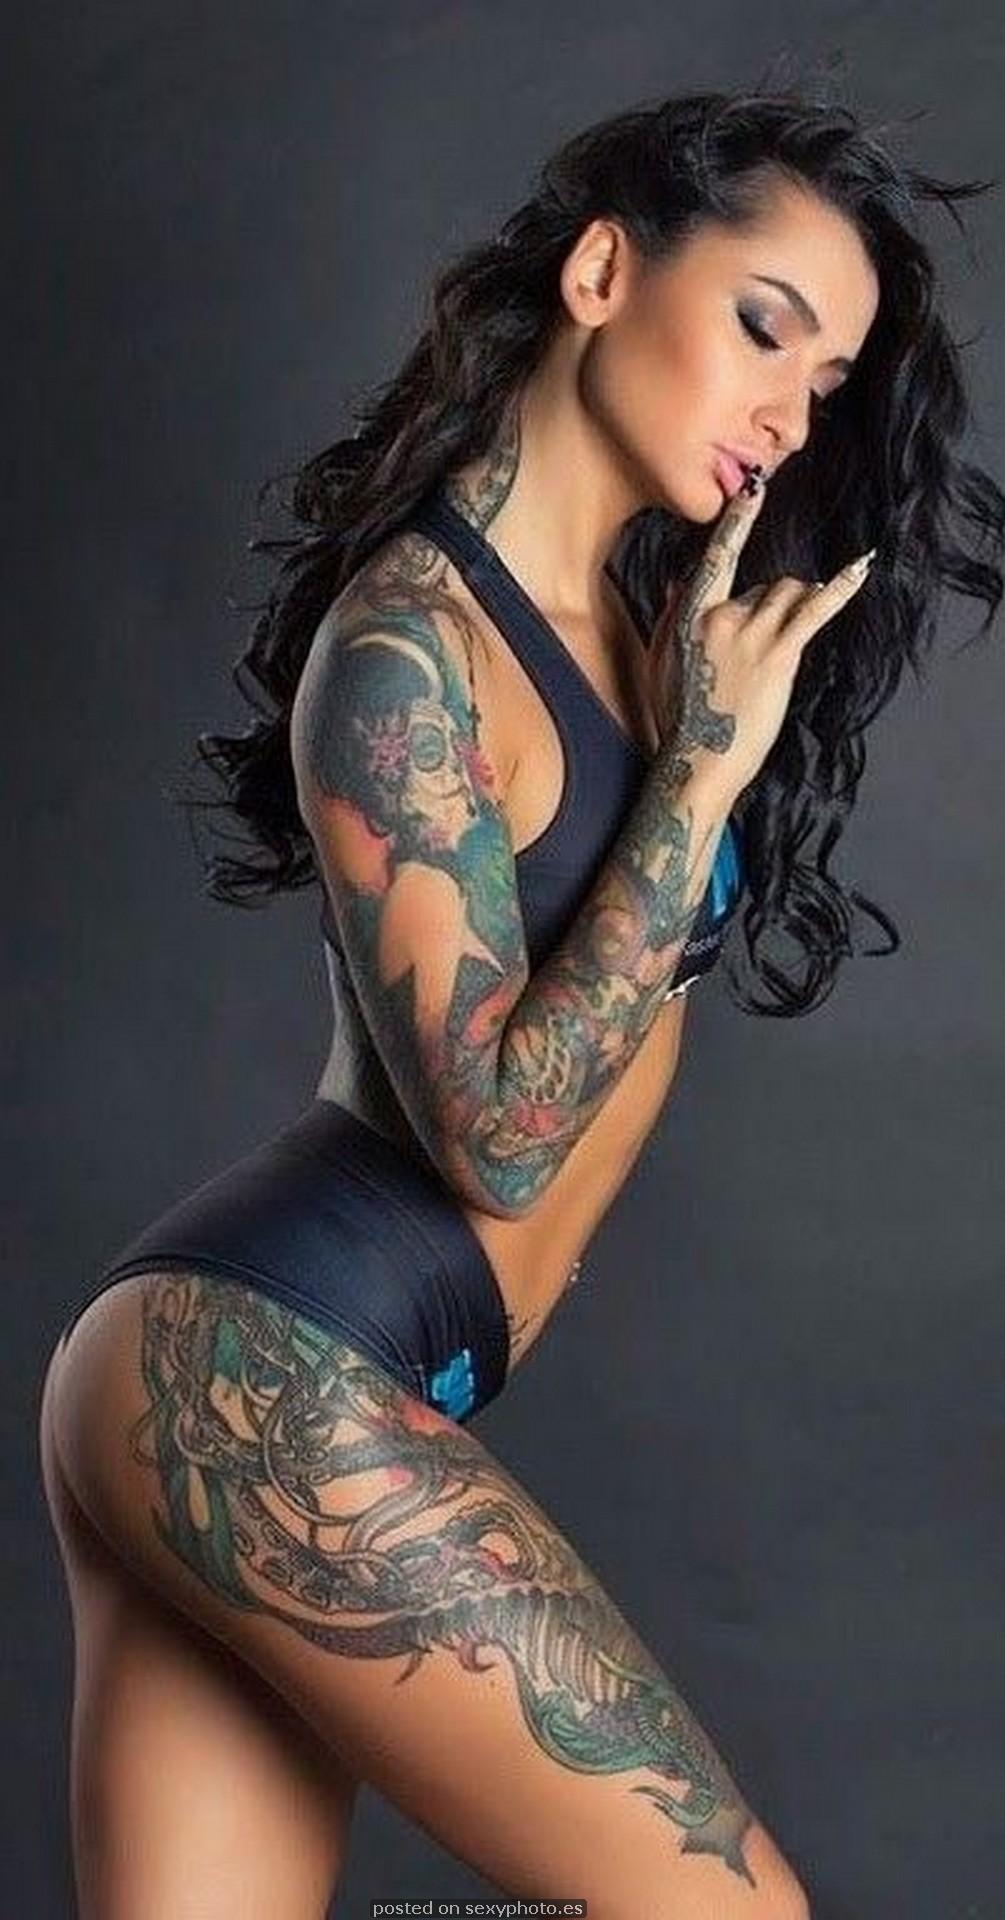 hot tattos-sexy tattos-tatuajes sexis-chicas tatuajes- culos bonitos - tetas